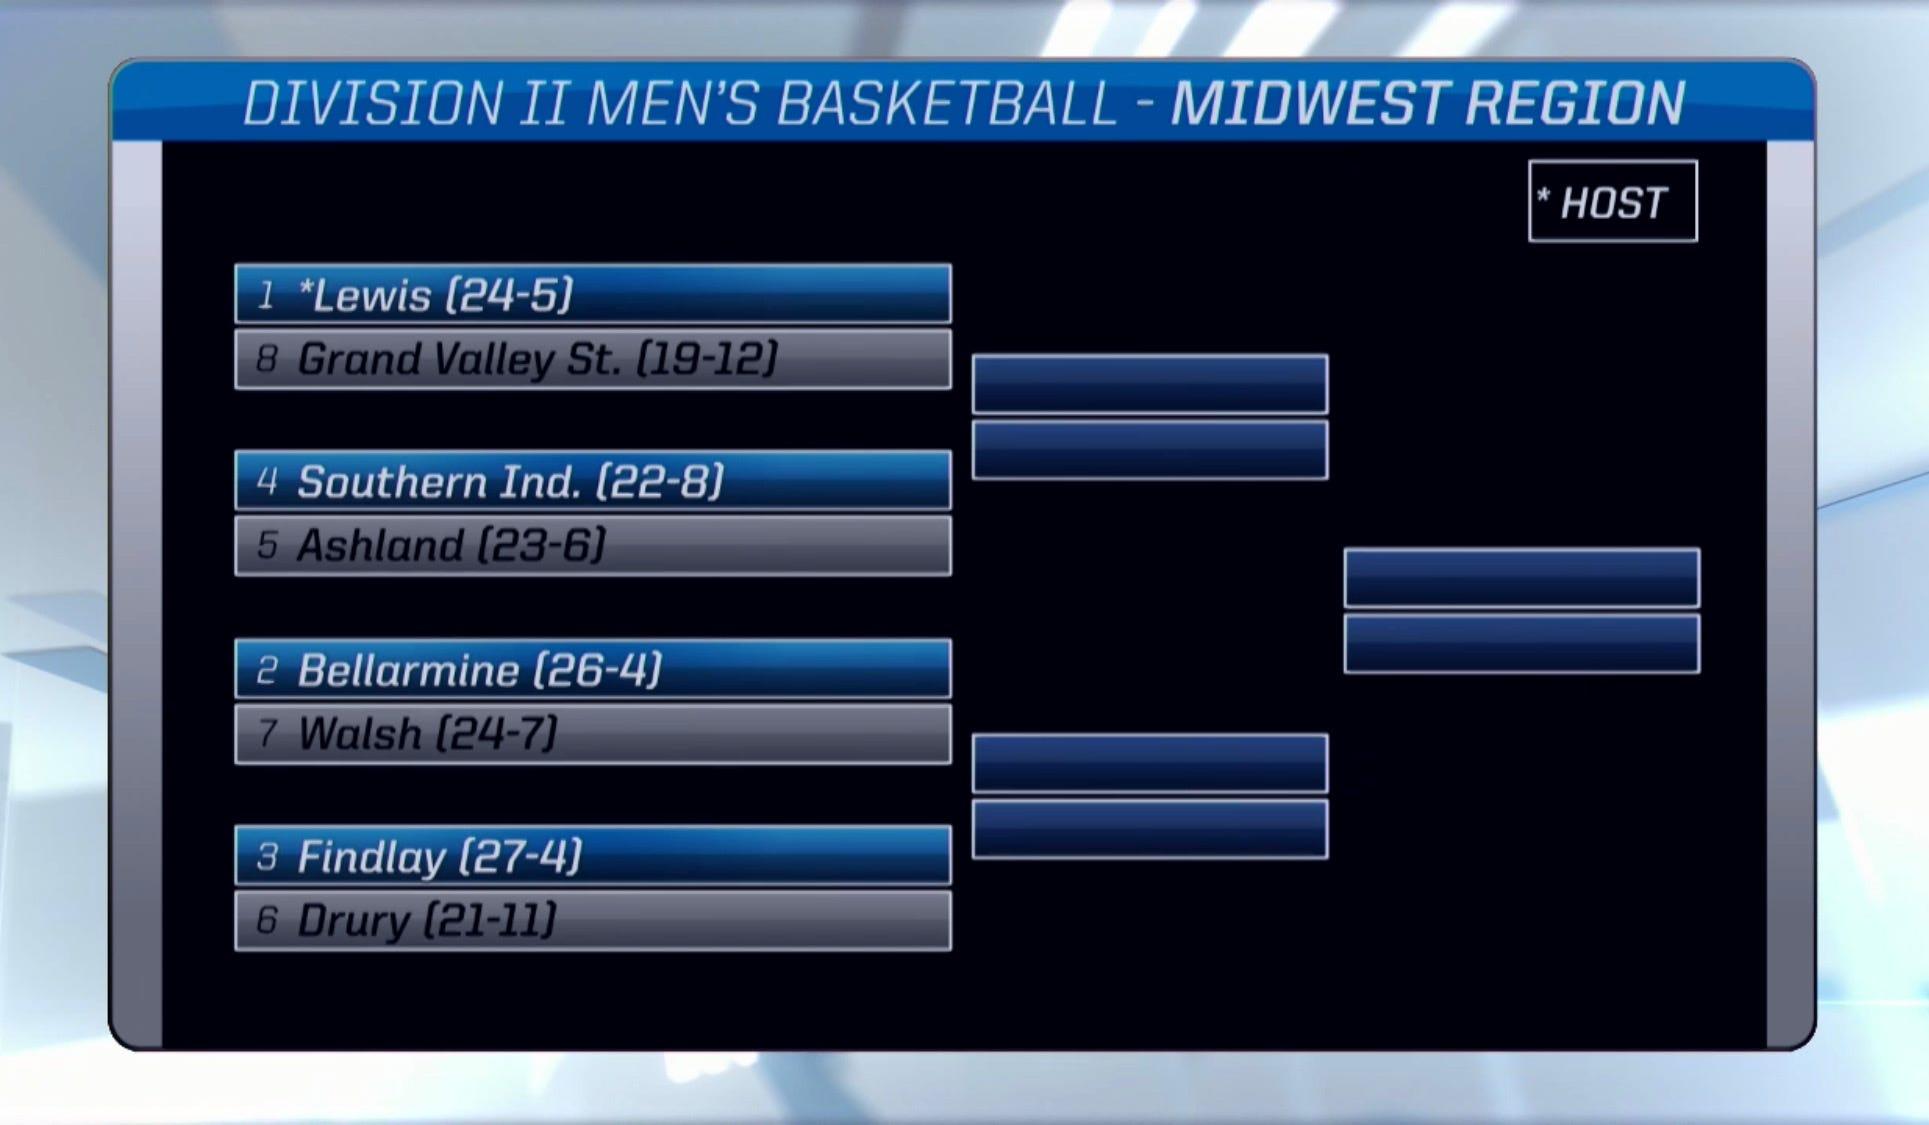 The 2019 Midwest Regional bracket.